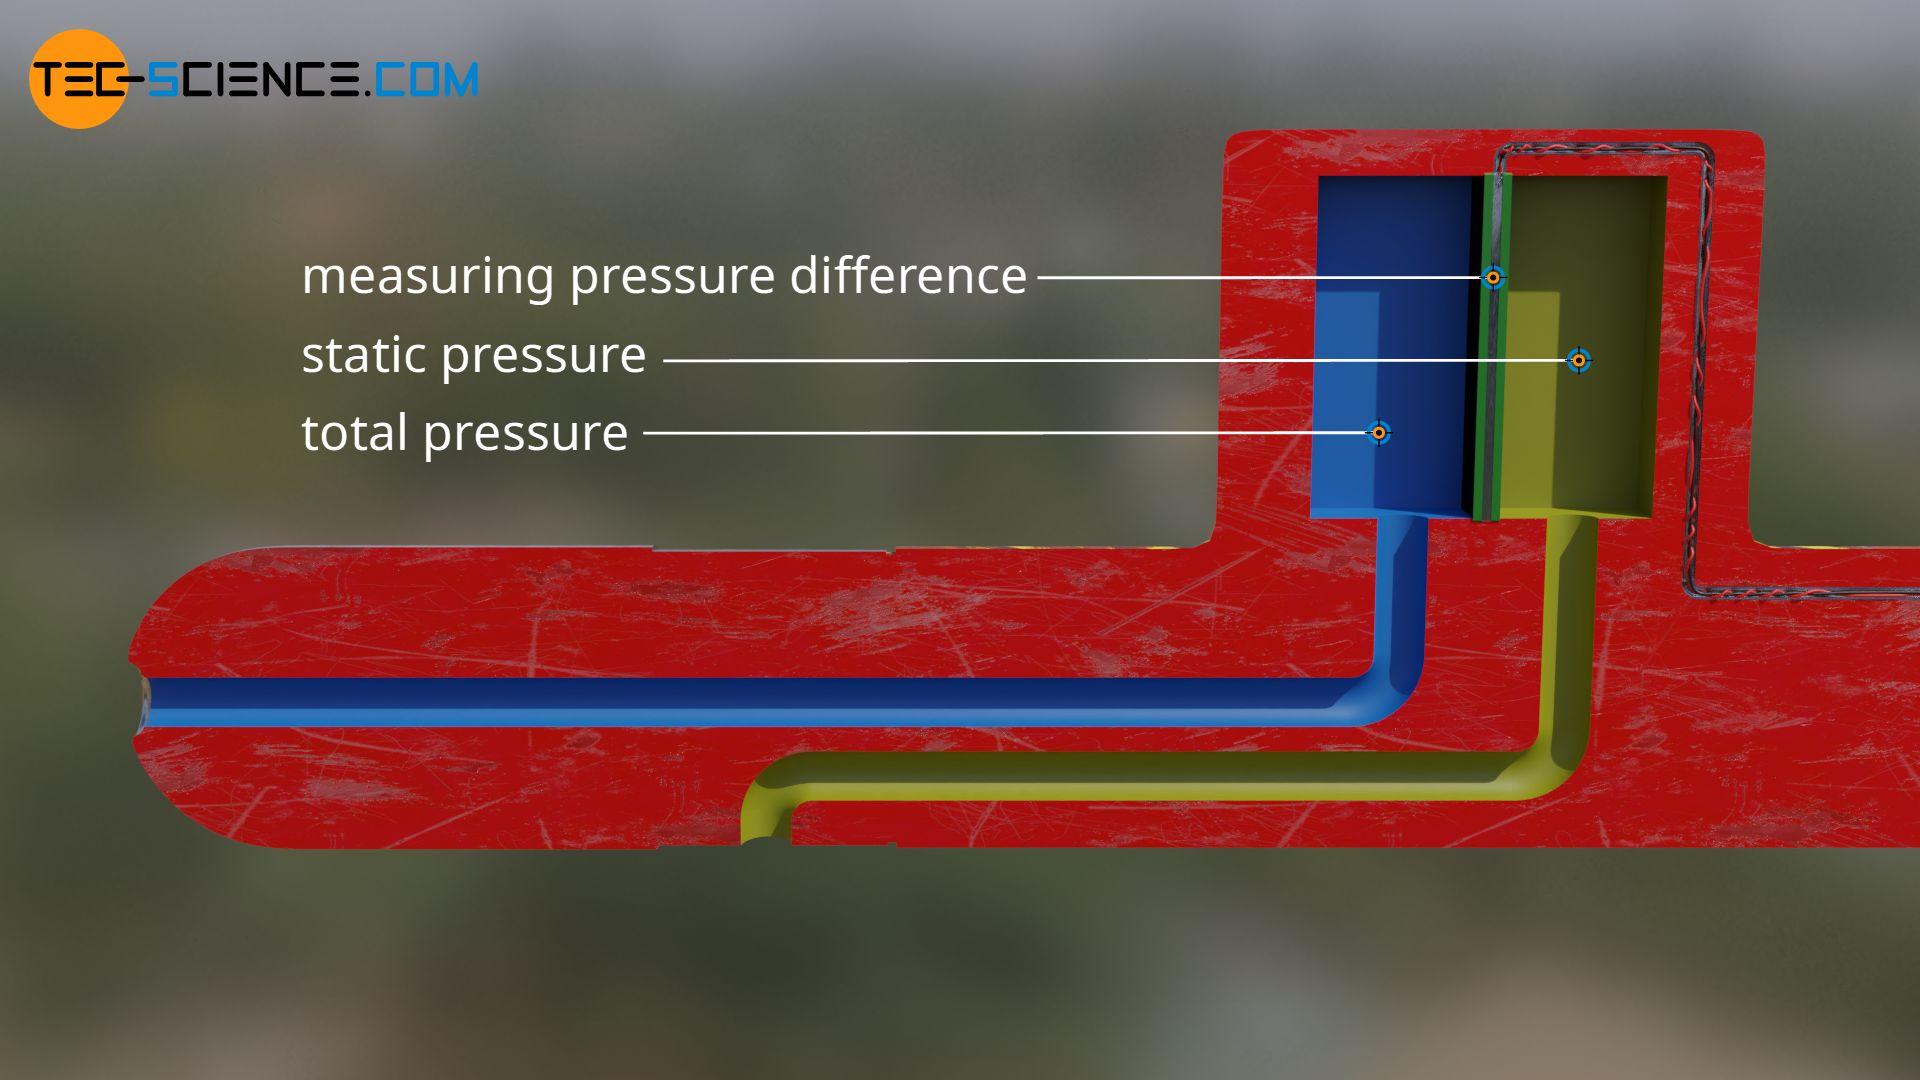 Prandtl tube with pressure sensor